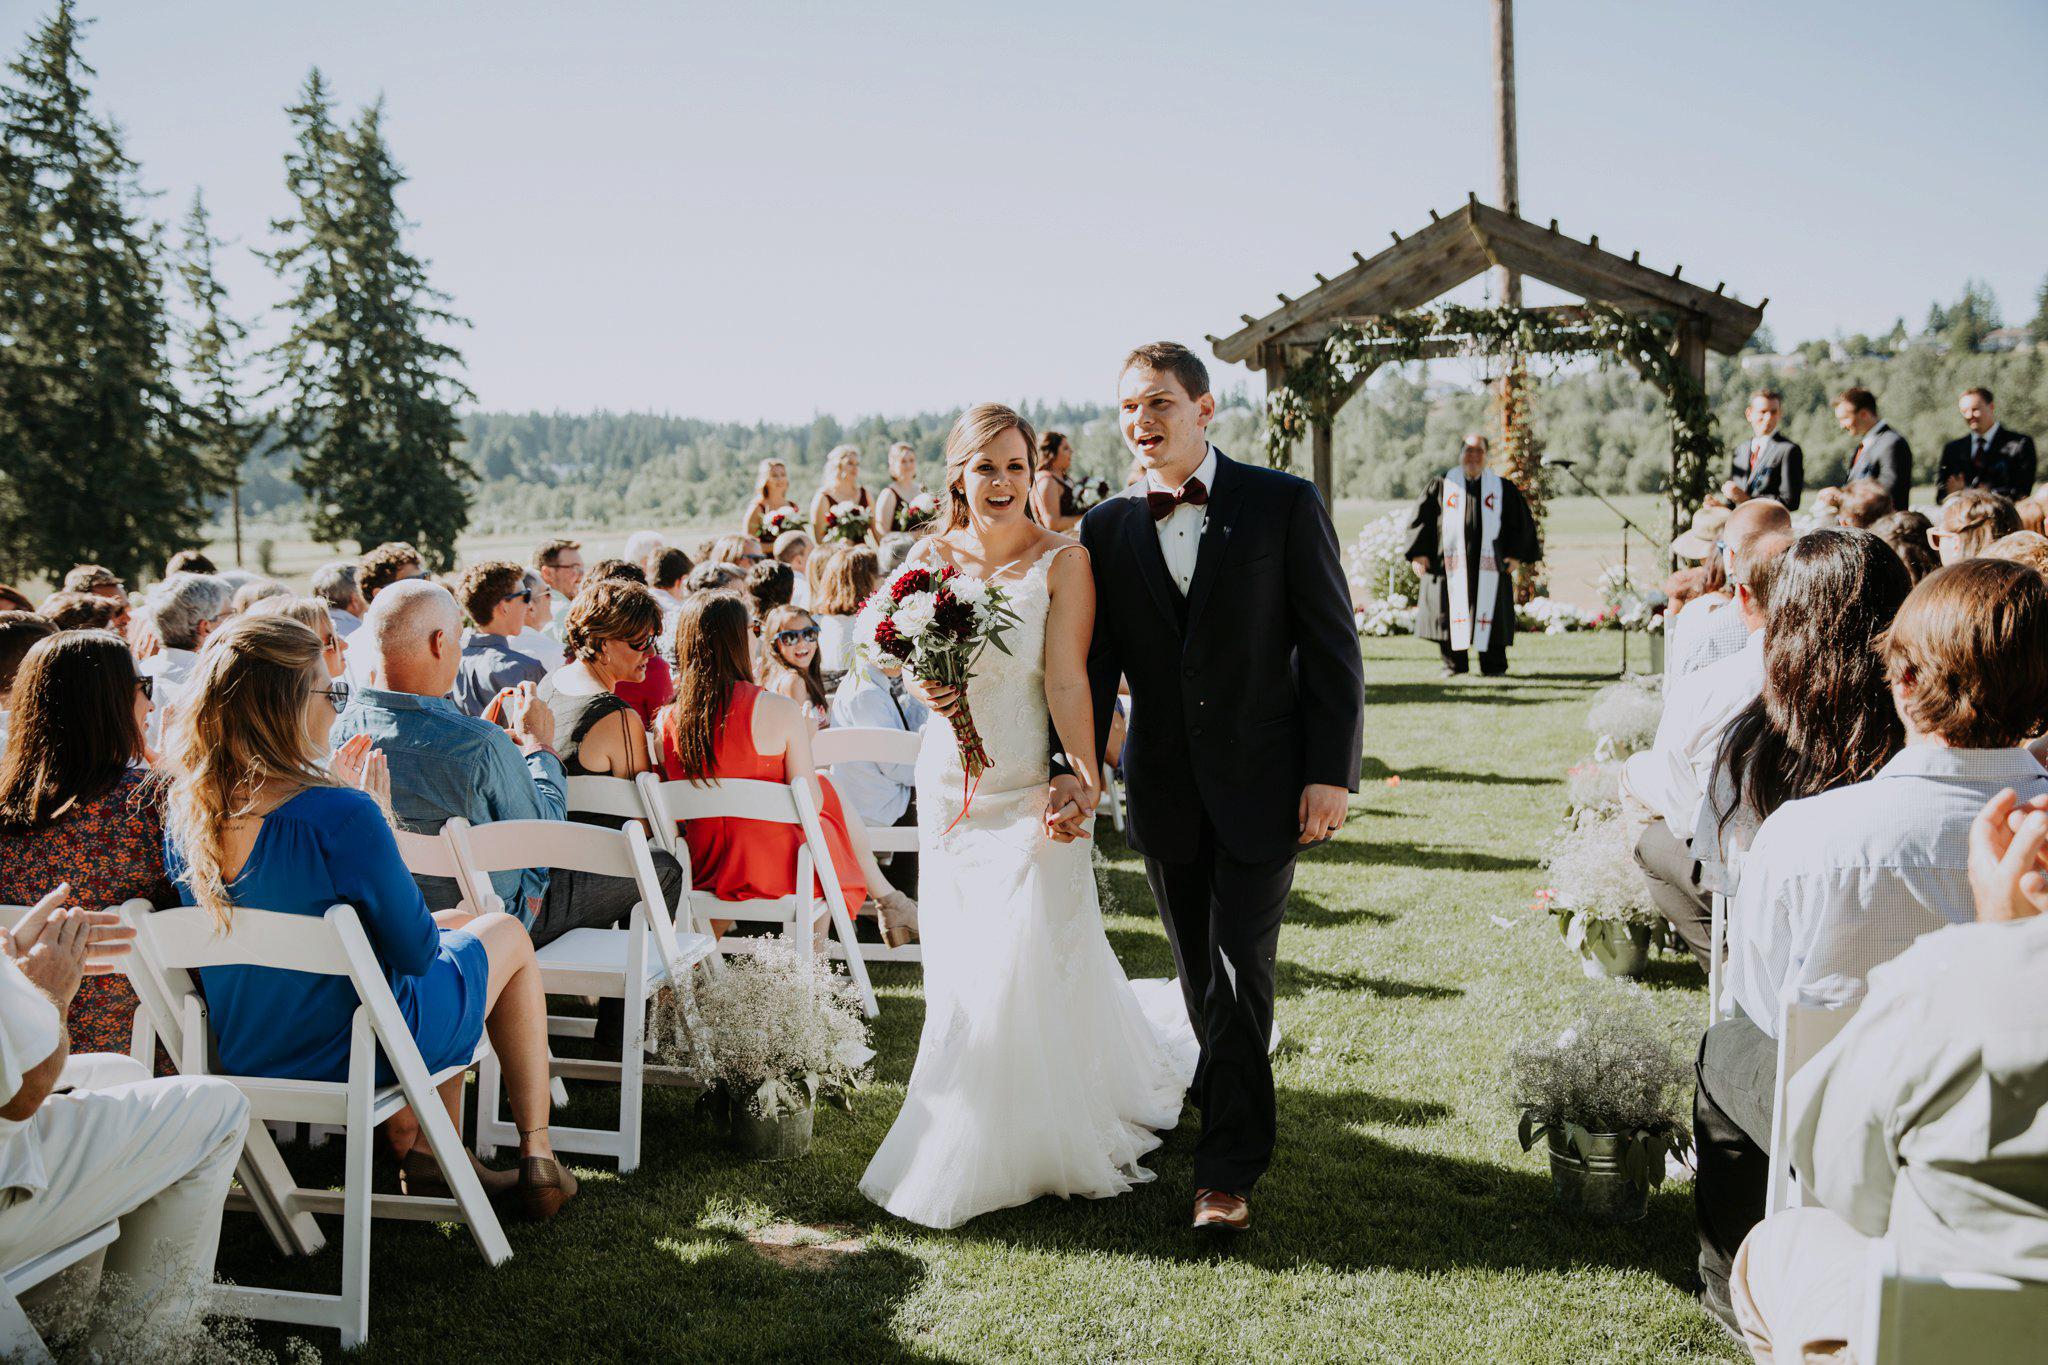 kristen-and-cody-the-kelley-farm-wedding-seattle-photographer-caitlyn-nikula-66.jpg